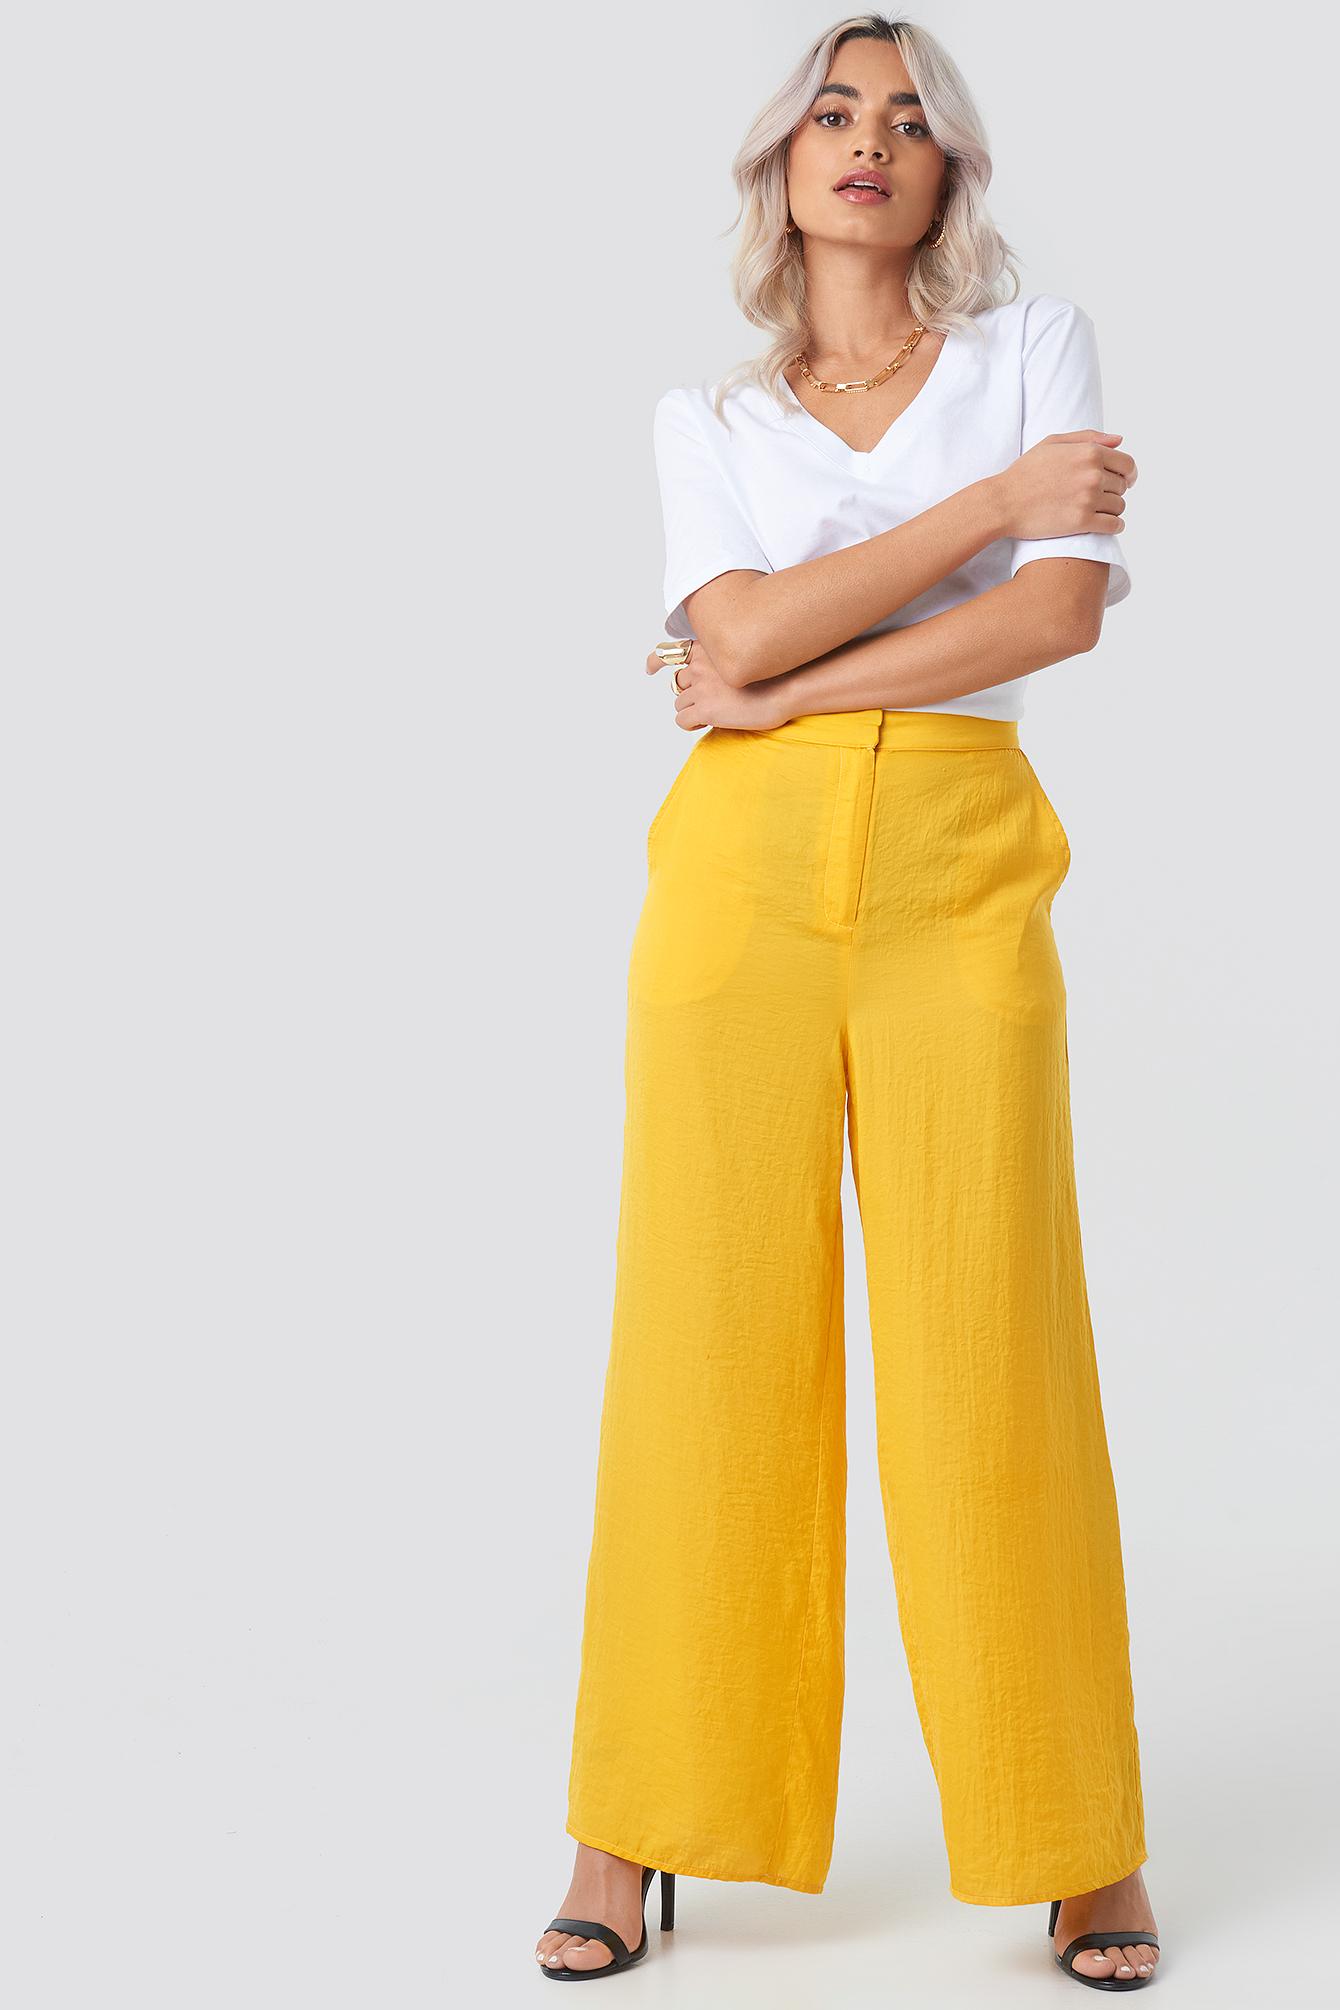 Billede af Aéryne Paris Adeline Trousers - Yellow